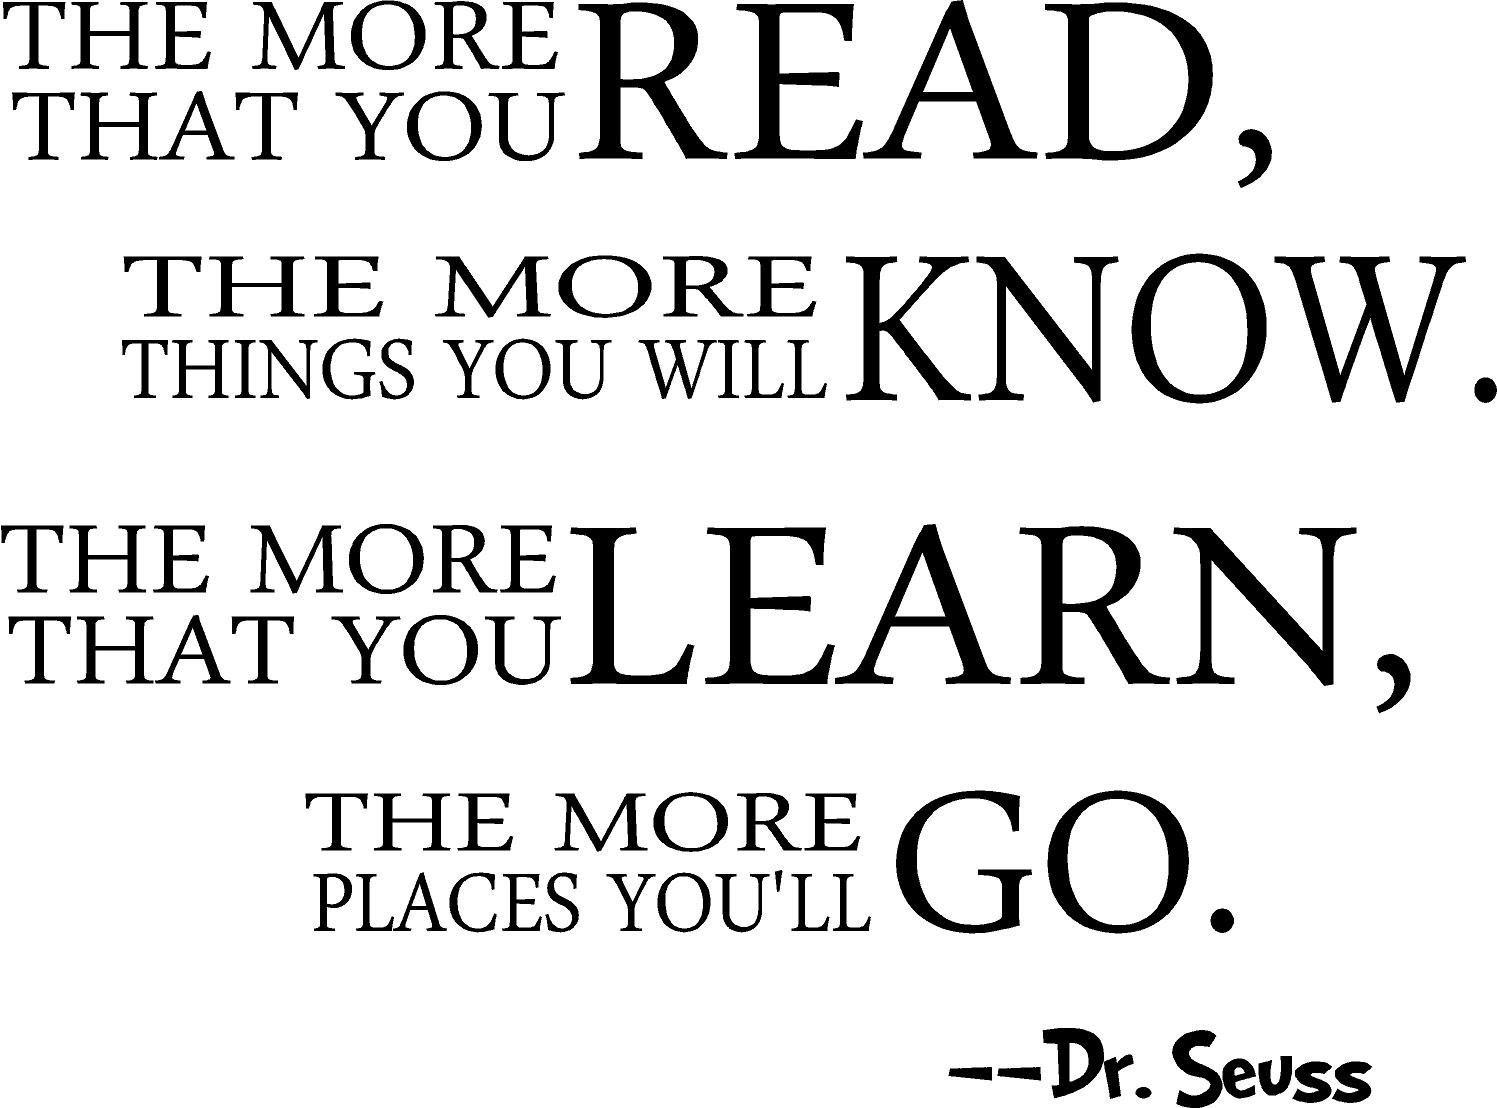 Dr Seuss Funny Quotes. QuotesGram